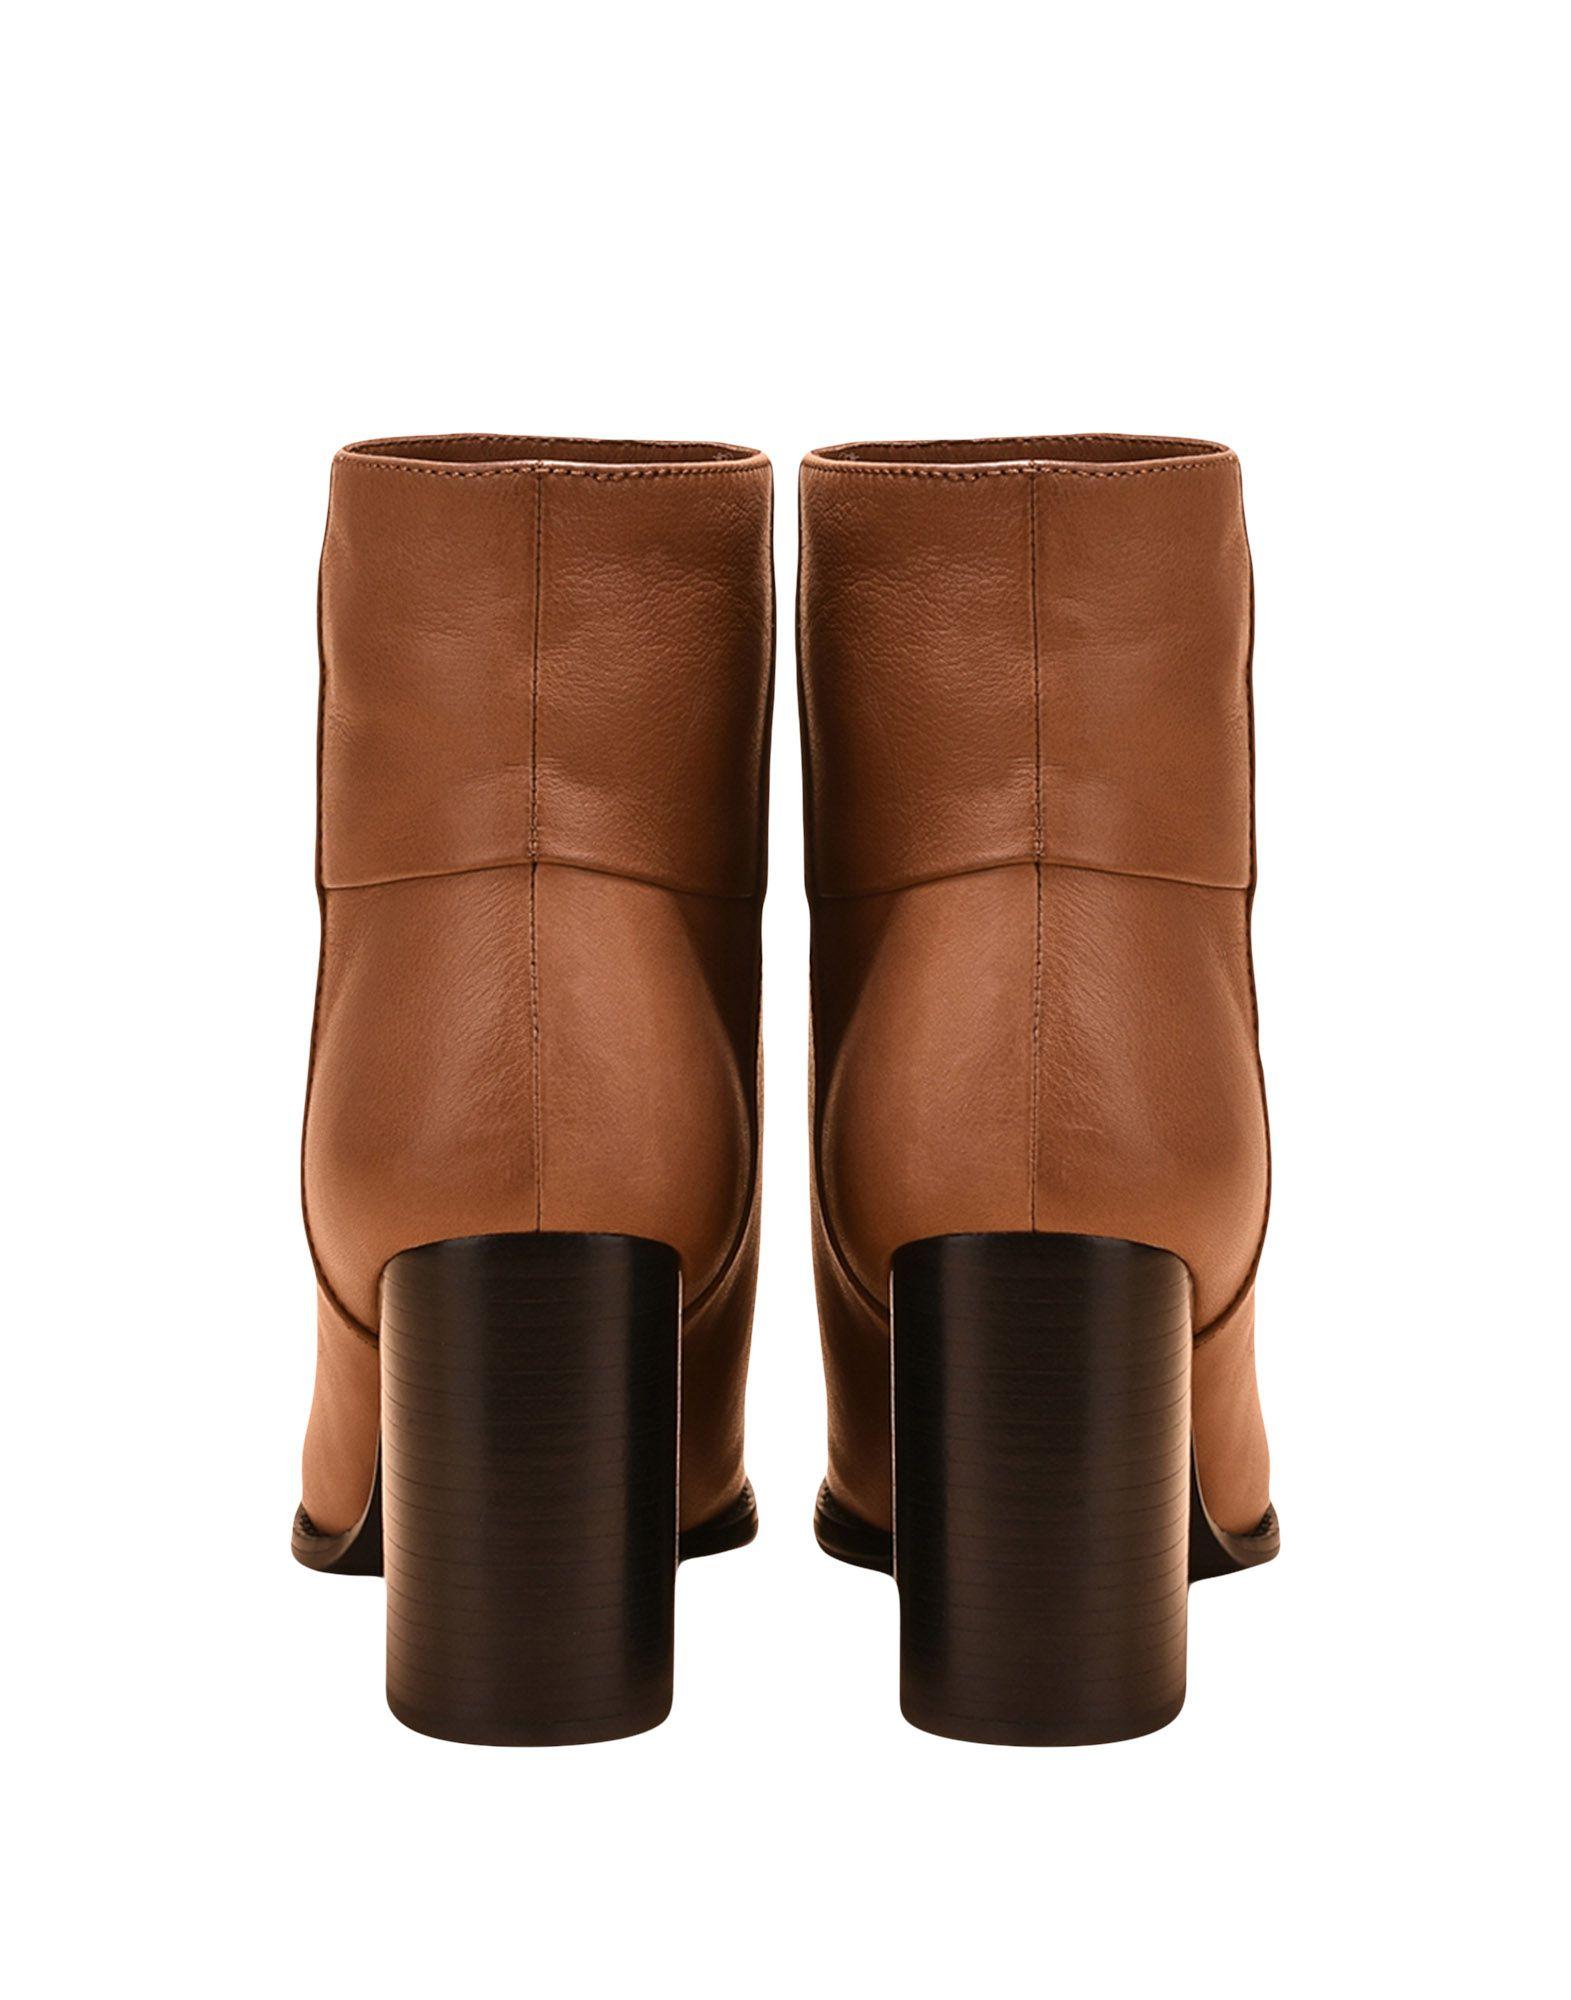 Rabatt Schuhe Jil Sander Navy Stiefelette Damen  11518202WH 11518202WH  b800c4